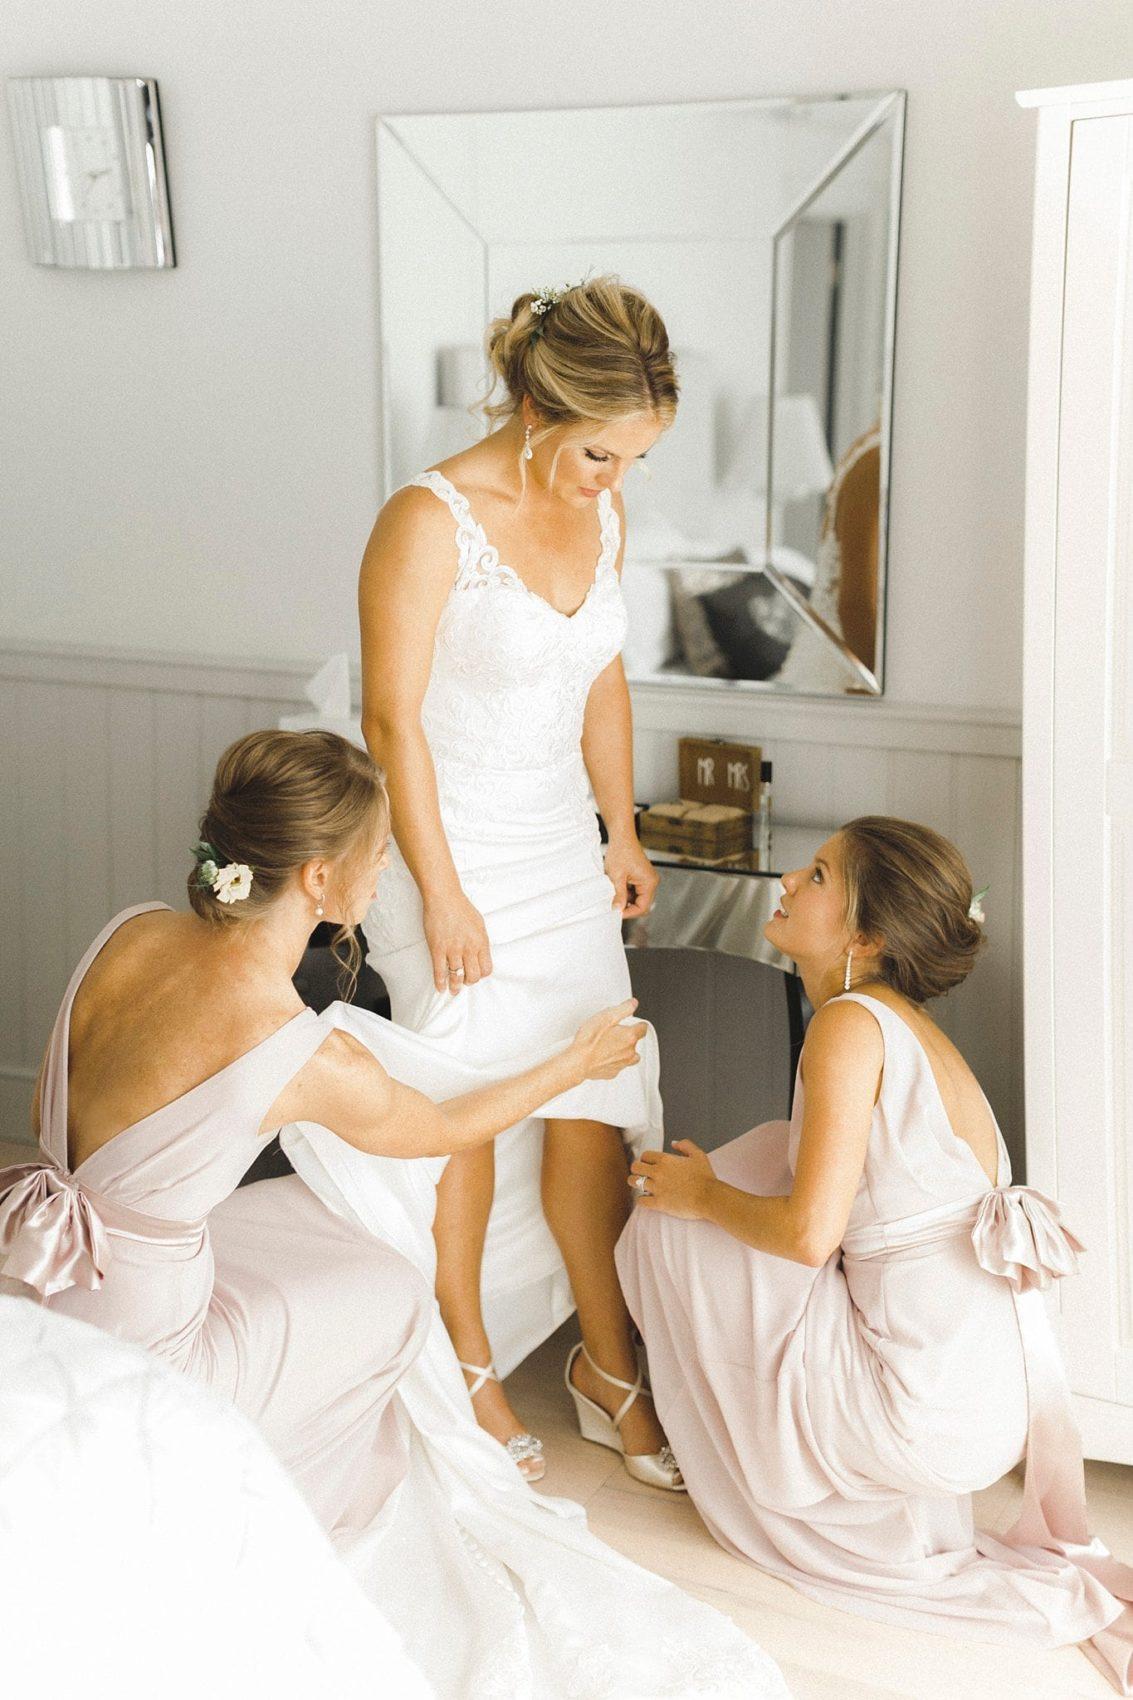 Girls, bride, bridesmaids, wedding dress, shoes, helping hand, right hand women